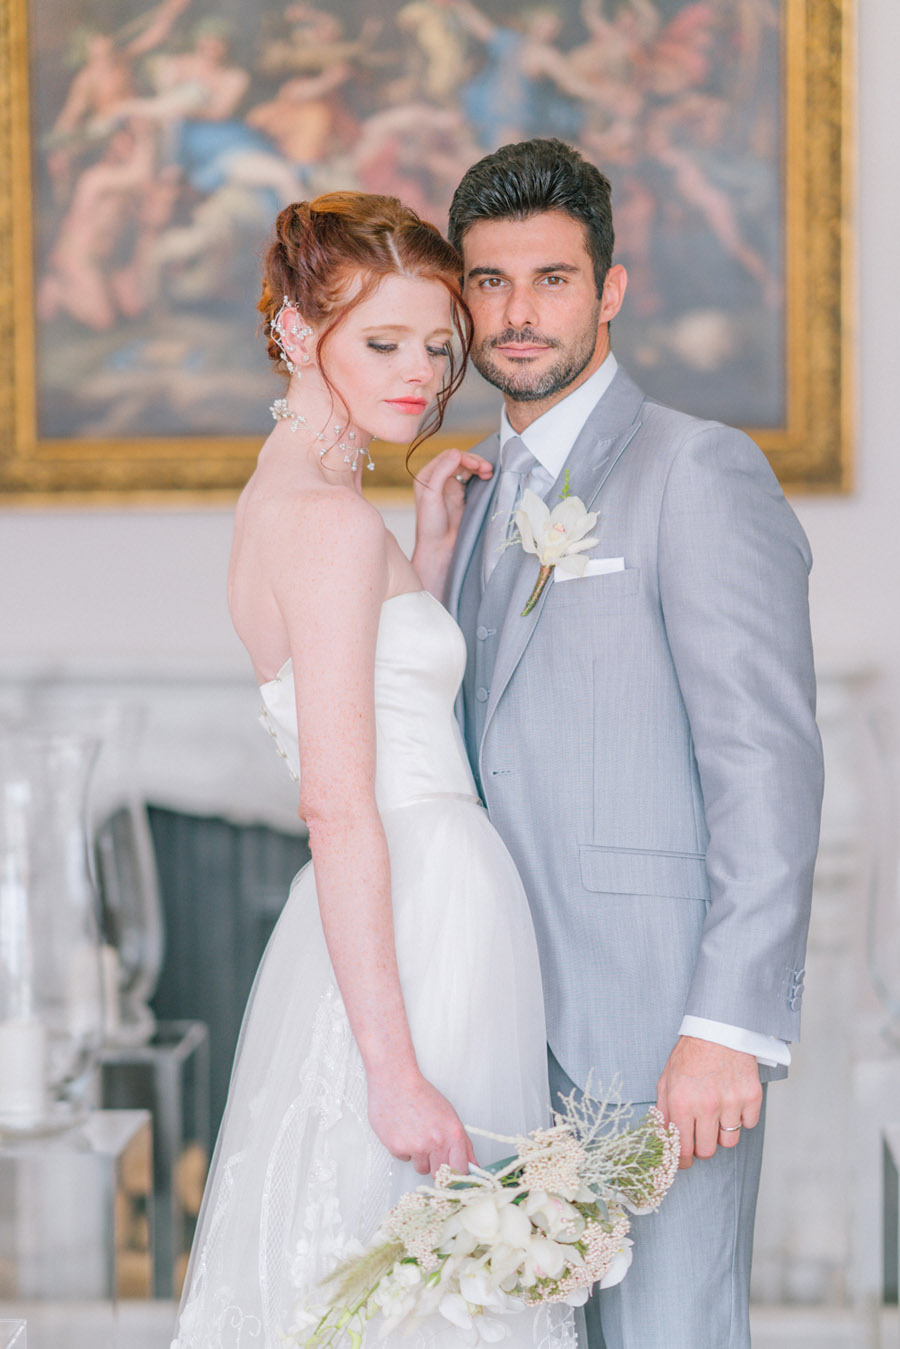 Beautiful emerald green and mustard wedding style ideas, photography by Ioana Porav (15)